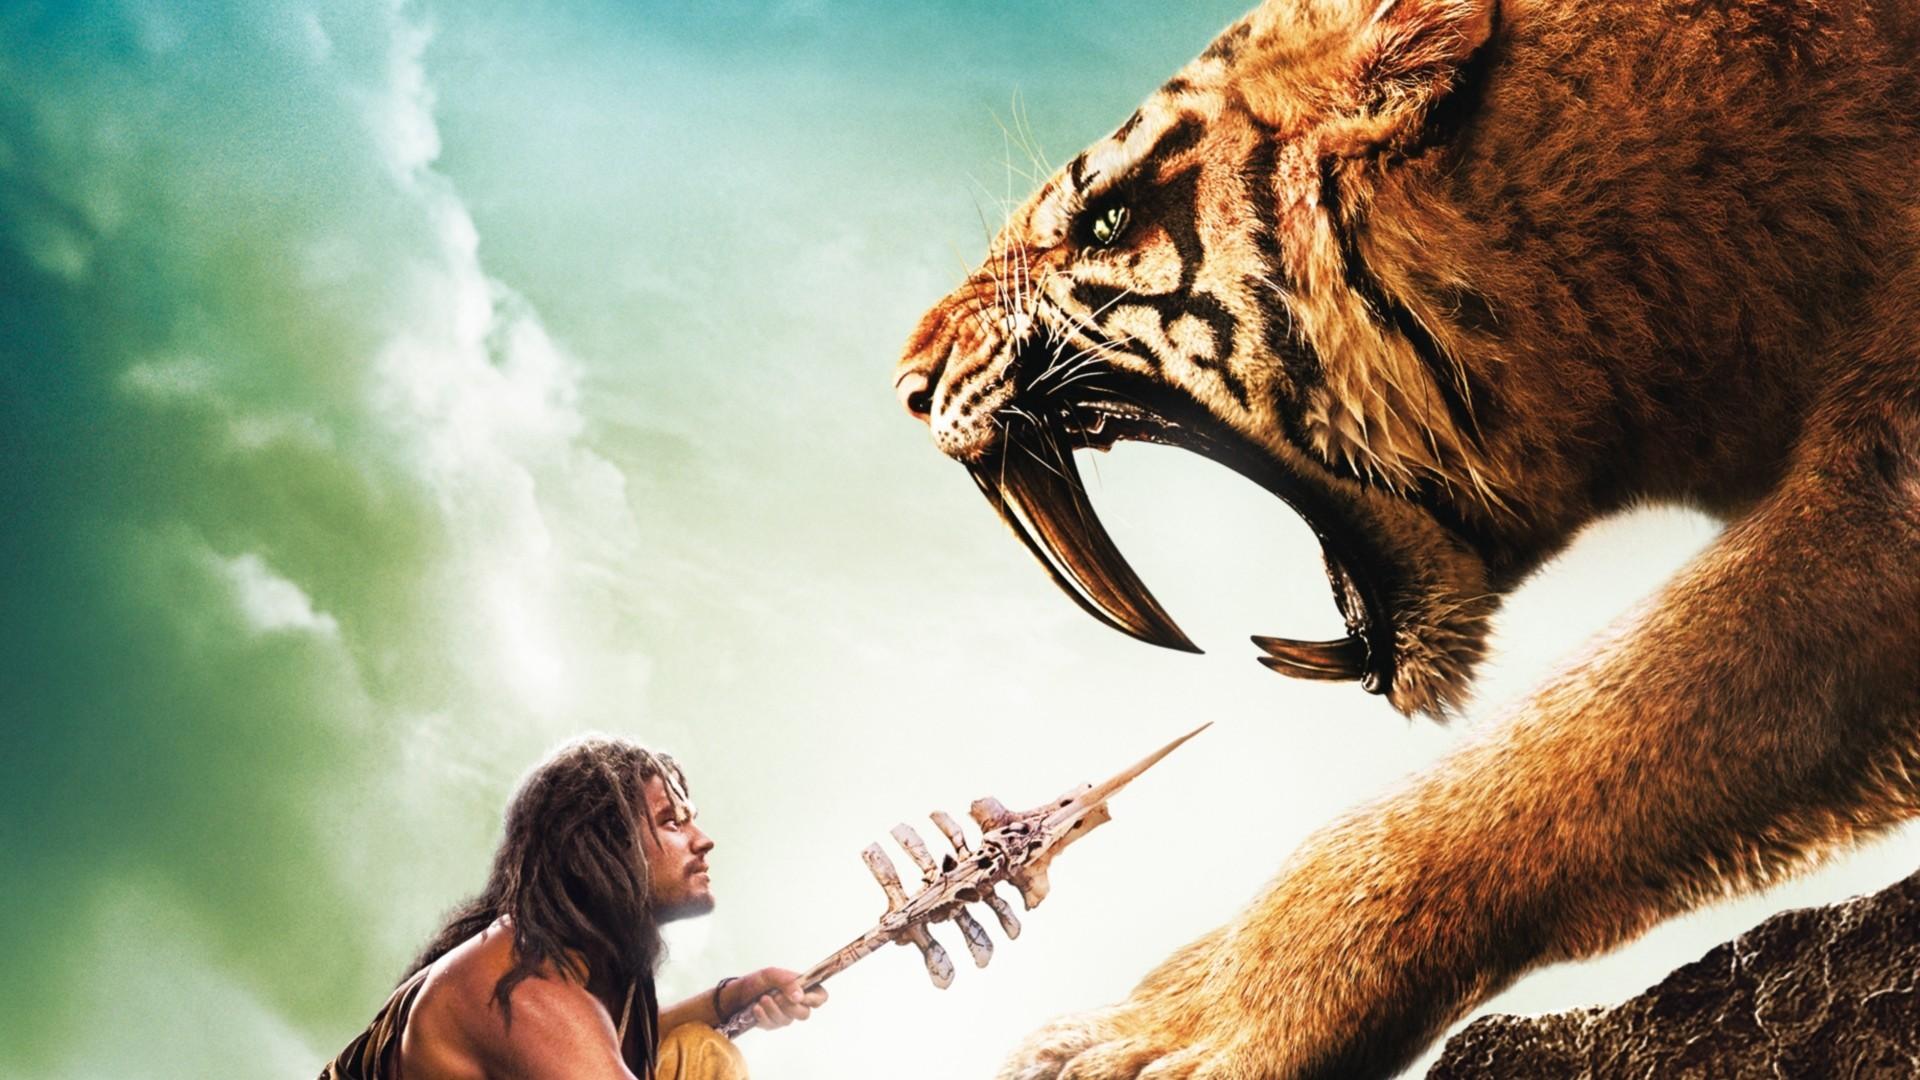 10000 bc english movie free download